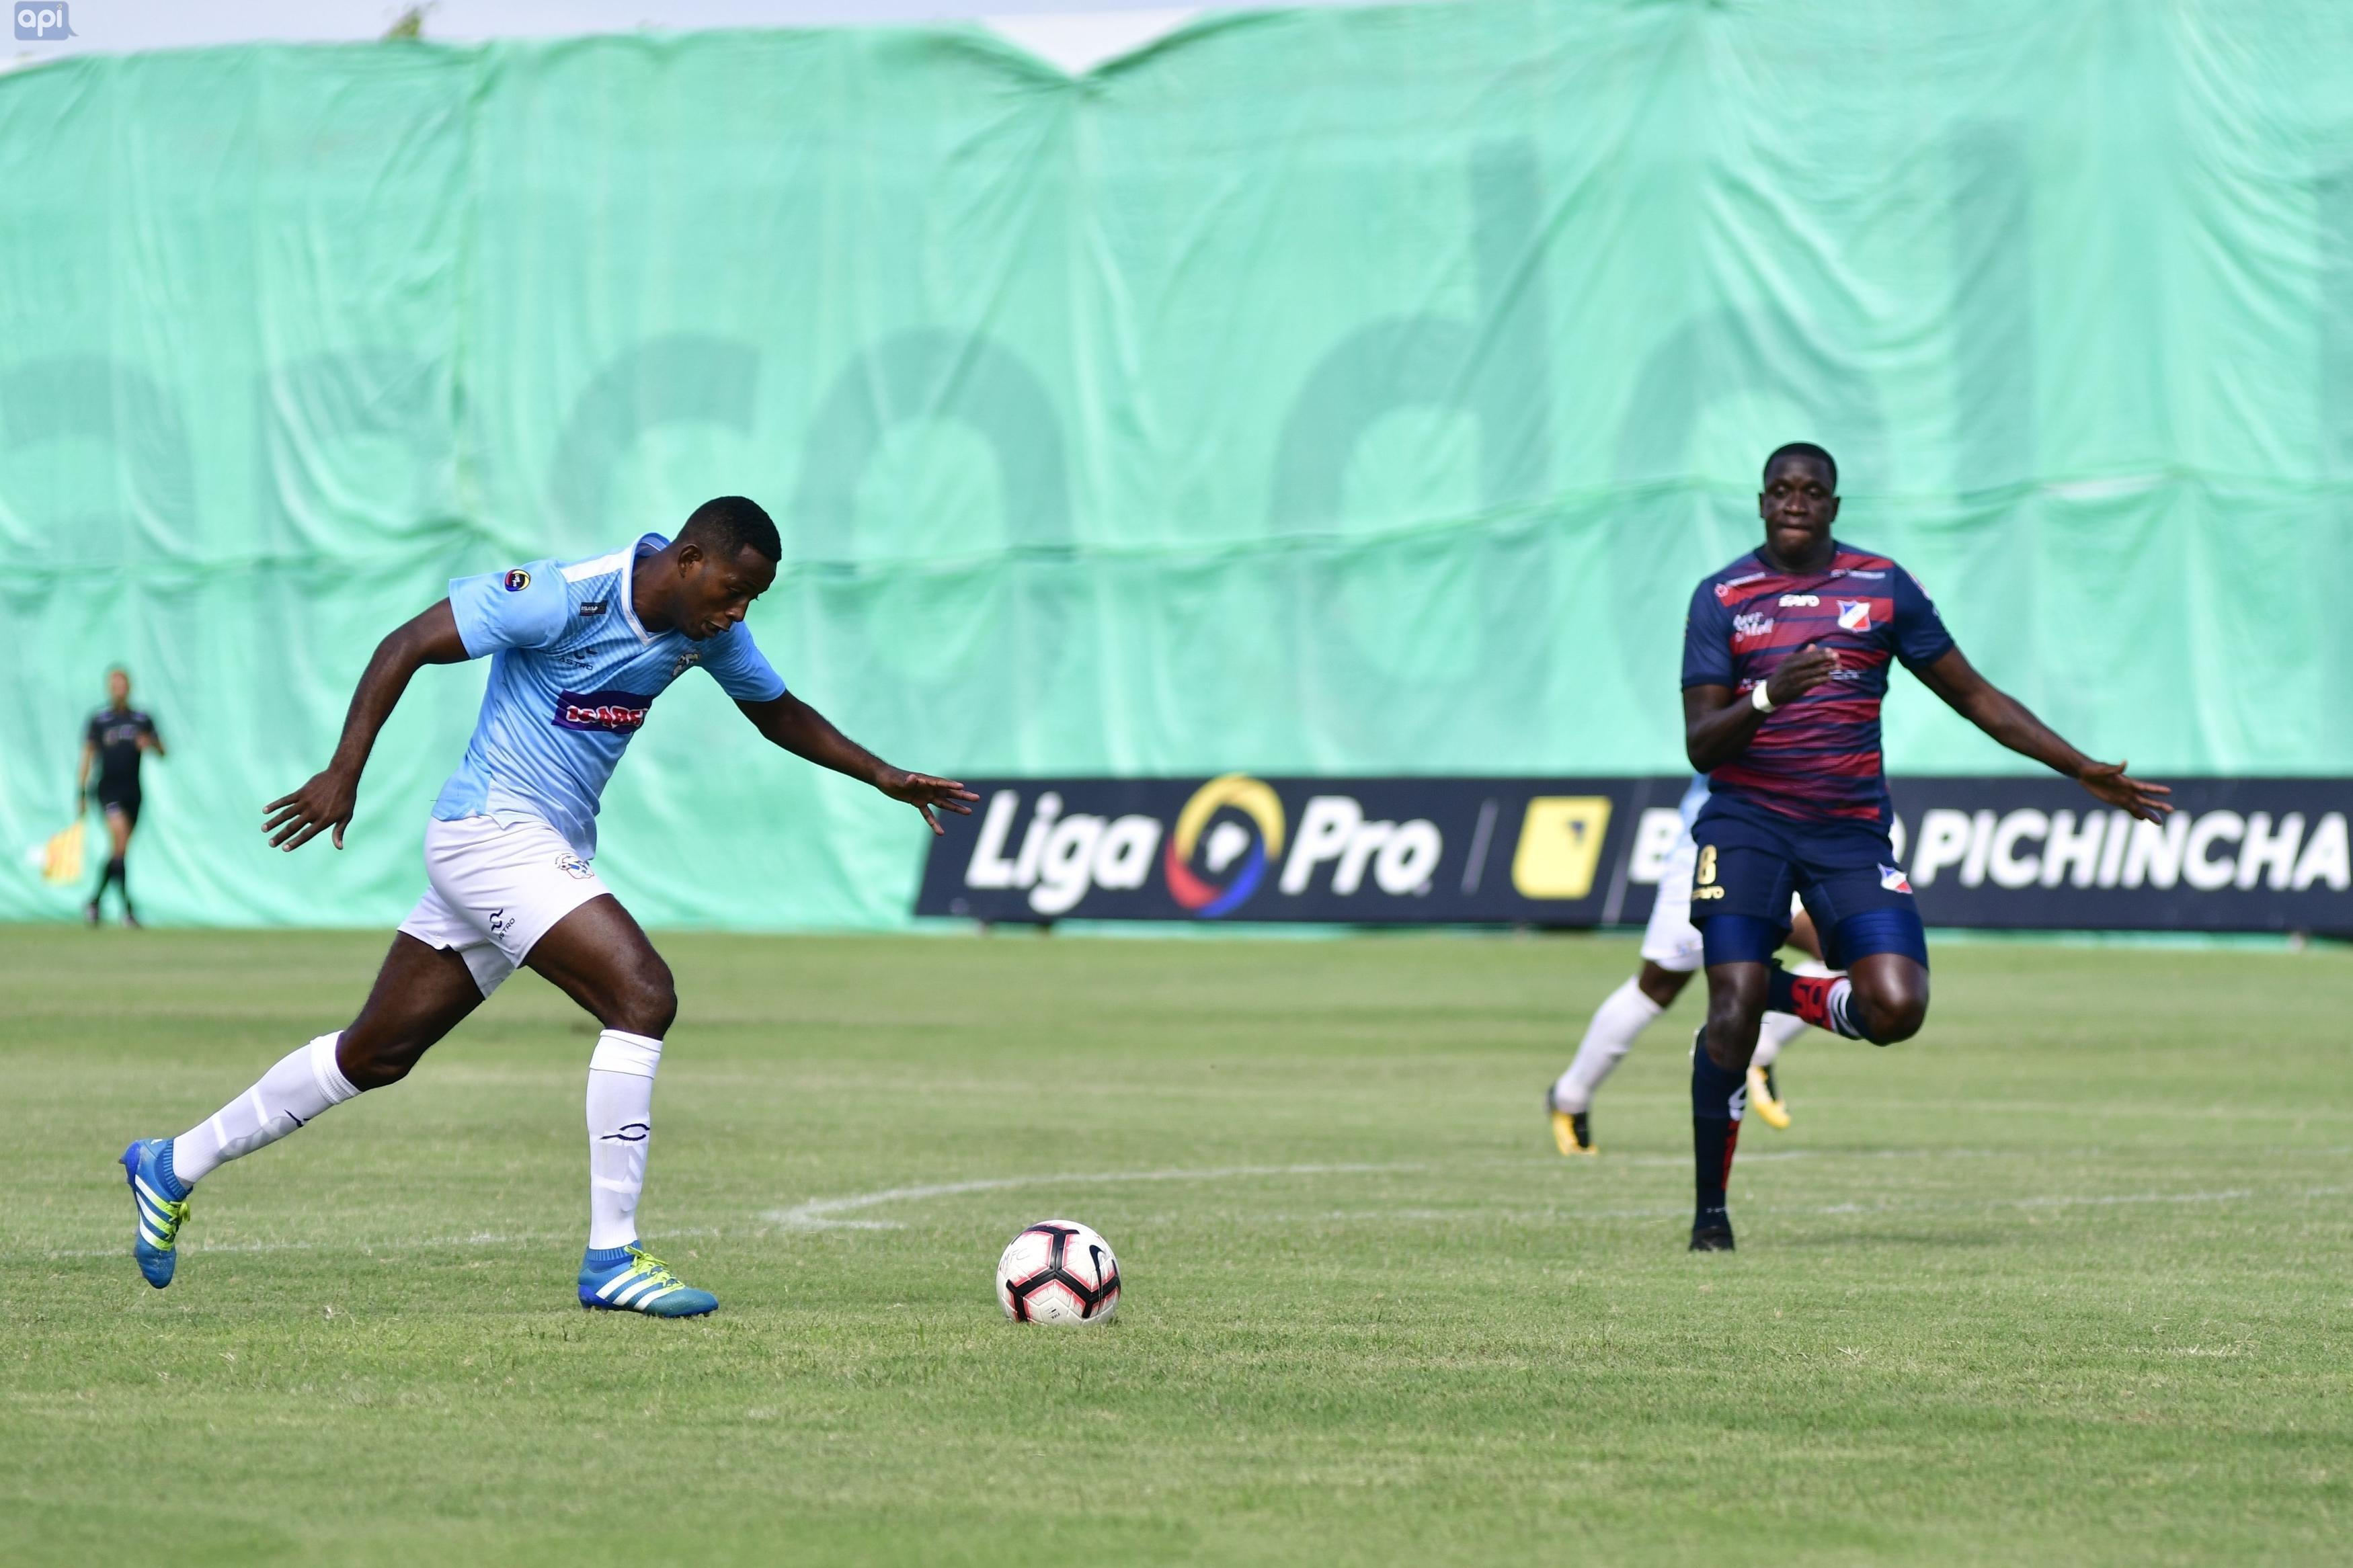 El Manta FC venció al Clan Juvenil por 3-0